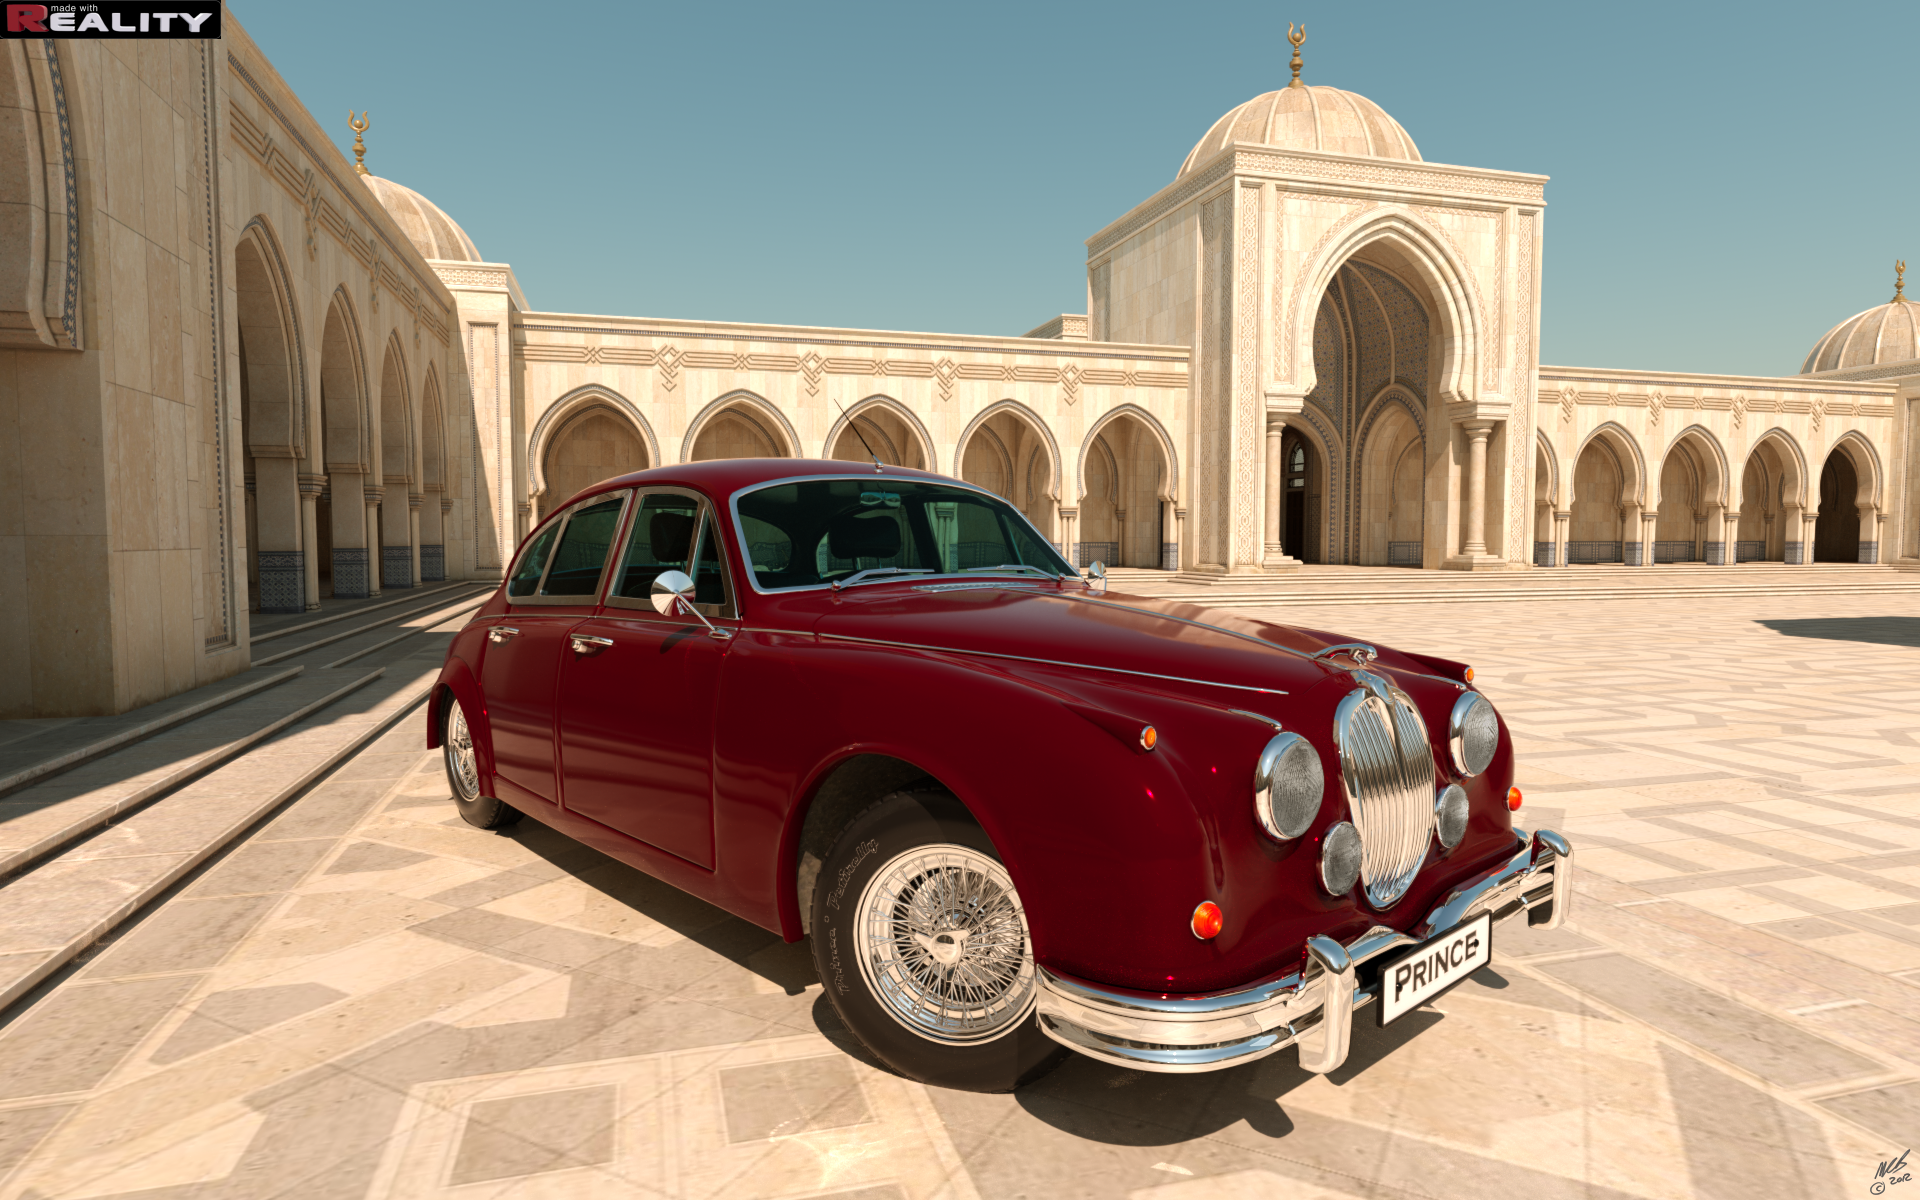 Arabian Prince II by mbinz